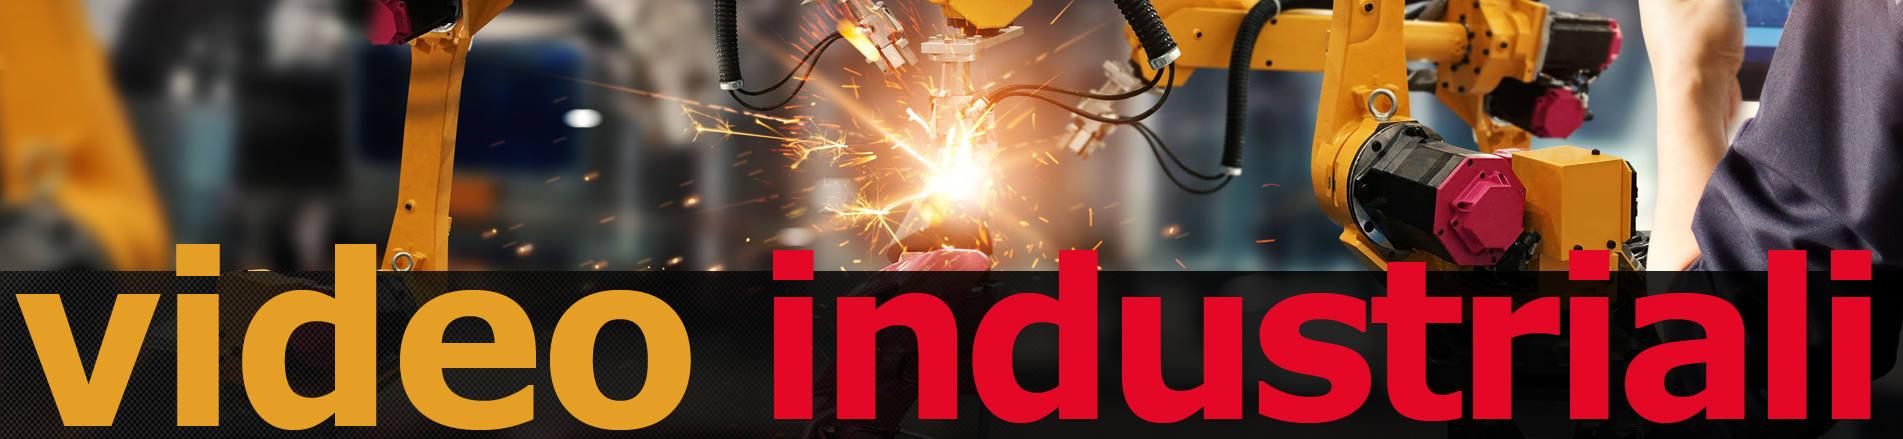 video-industriali